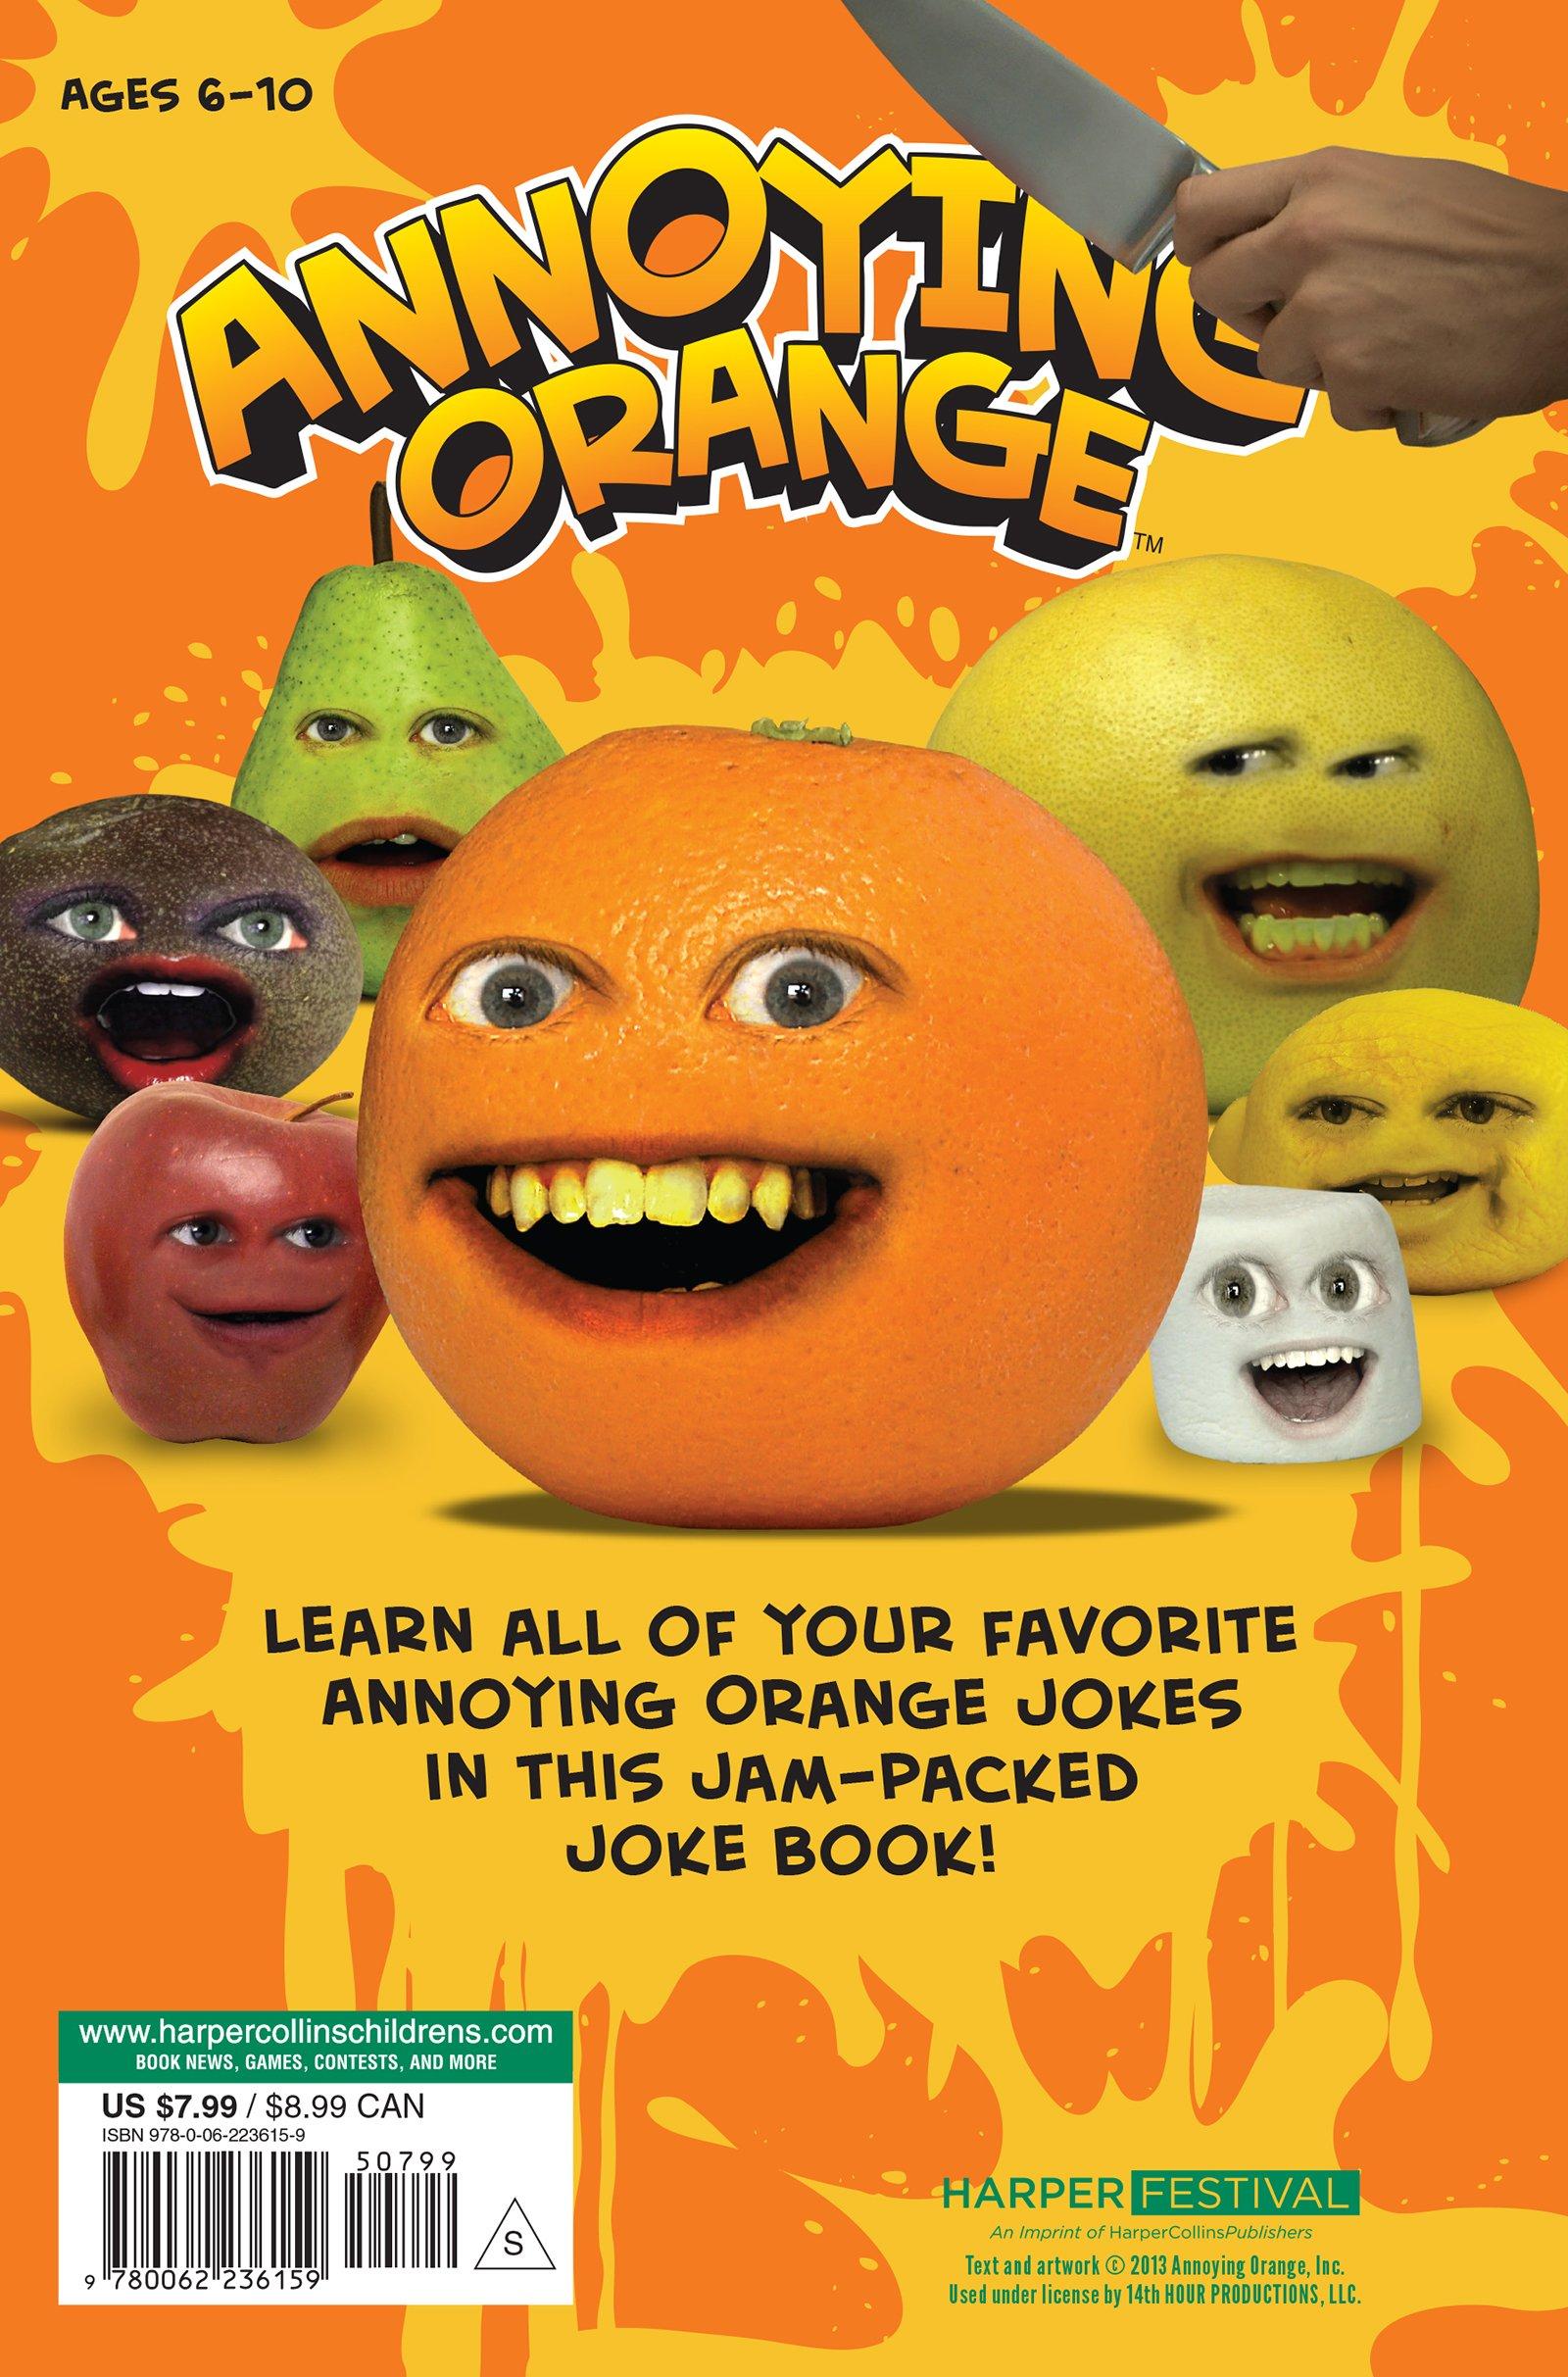 The Annoying Orange kapak